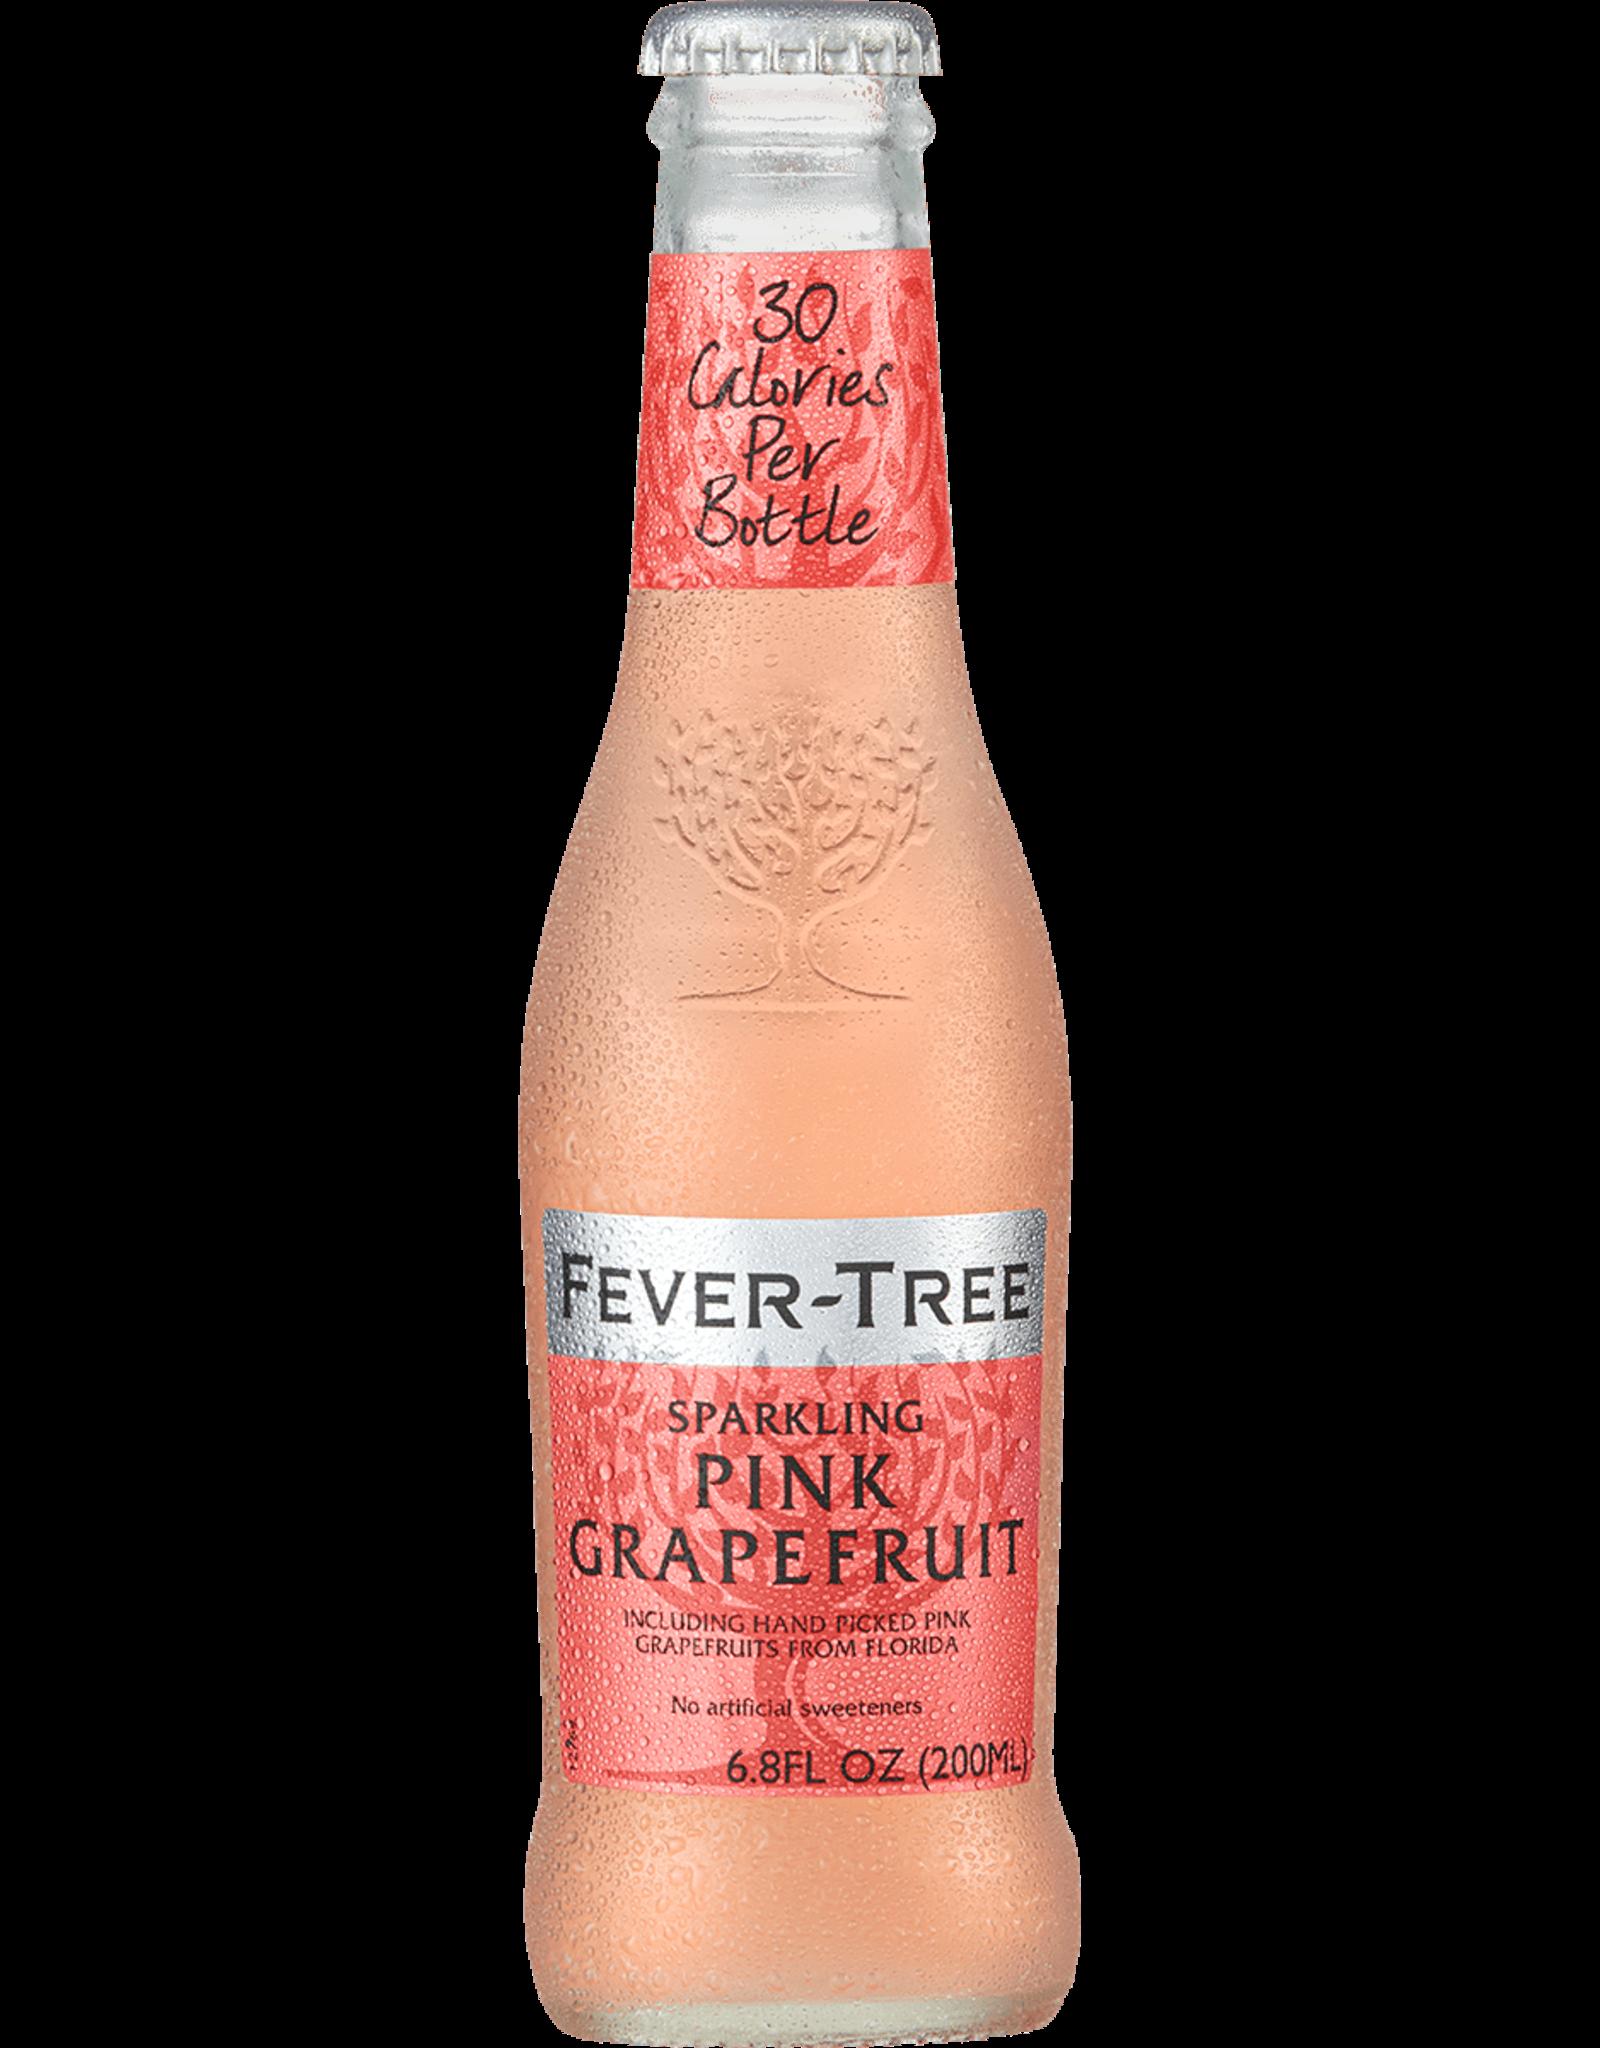 Fever-Tree Fever Tree Sparkling Pink Grapefruit